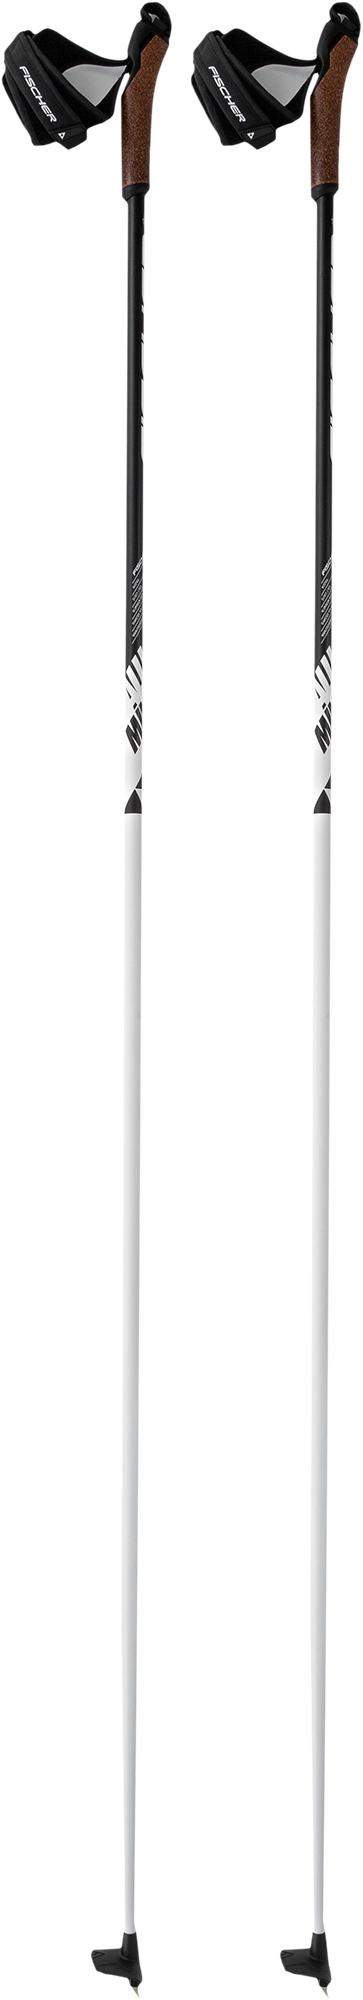 Fischer Палки для беговых лыж Fischer RC3, размер 170 палки для беговых лыж cliff 140 blue